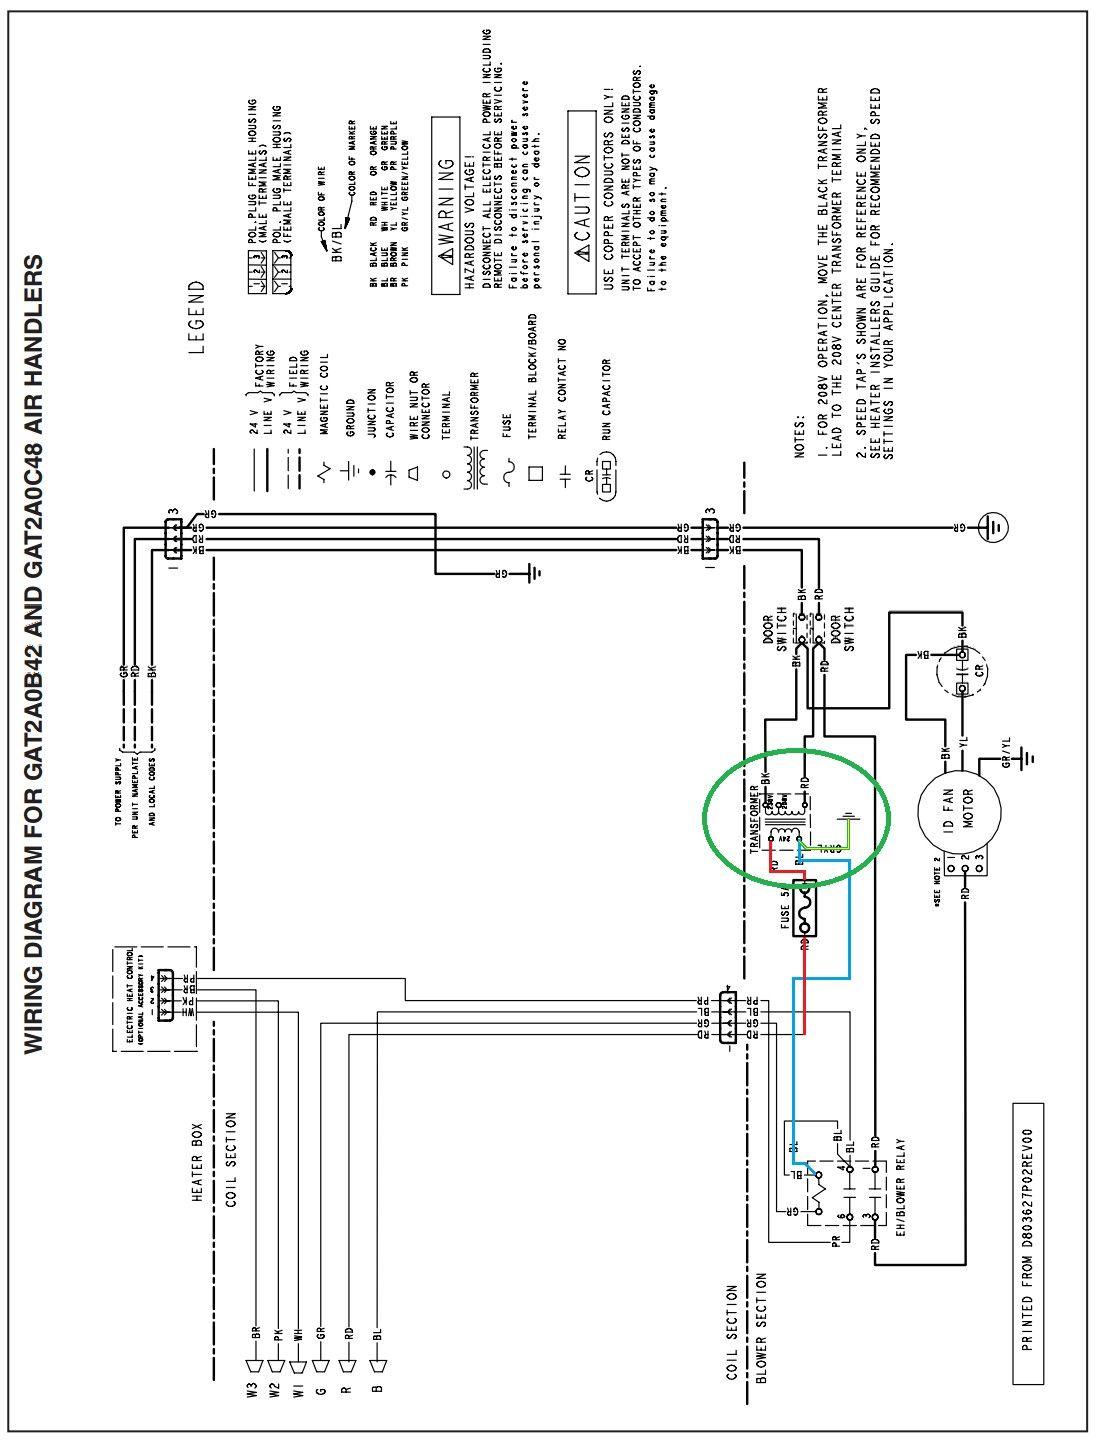 [WV_5394] Hvac Schematics And Diagrams Free Diagram